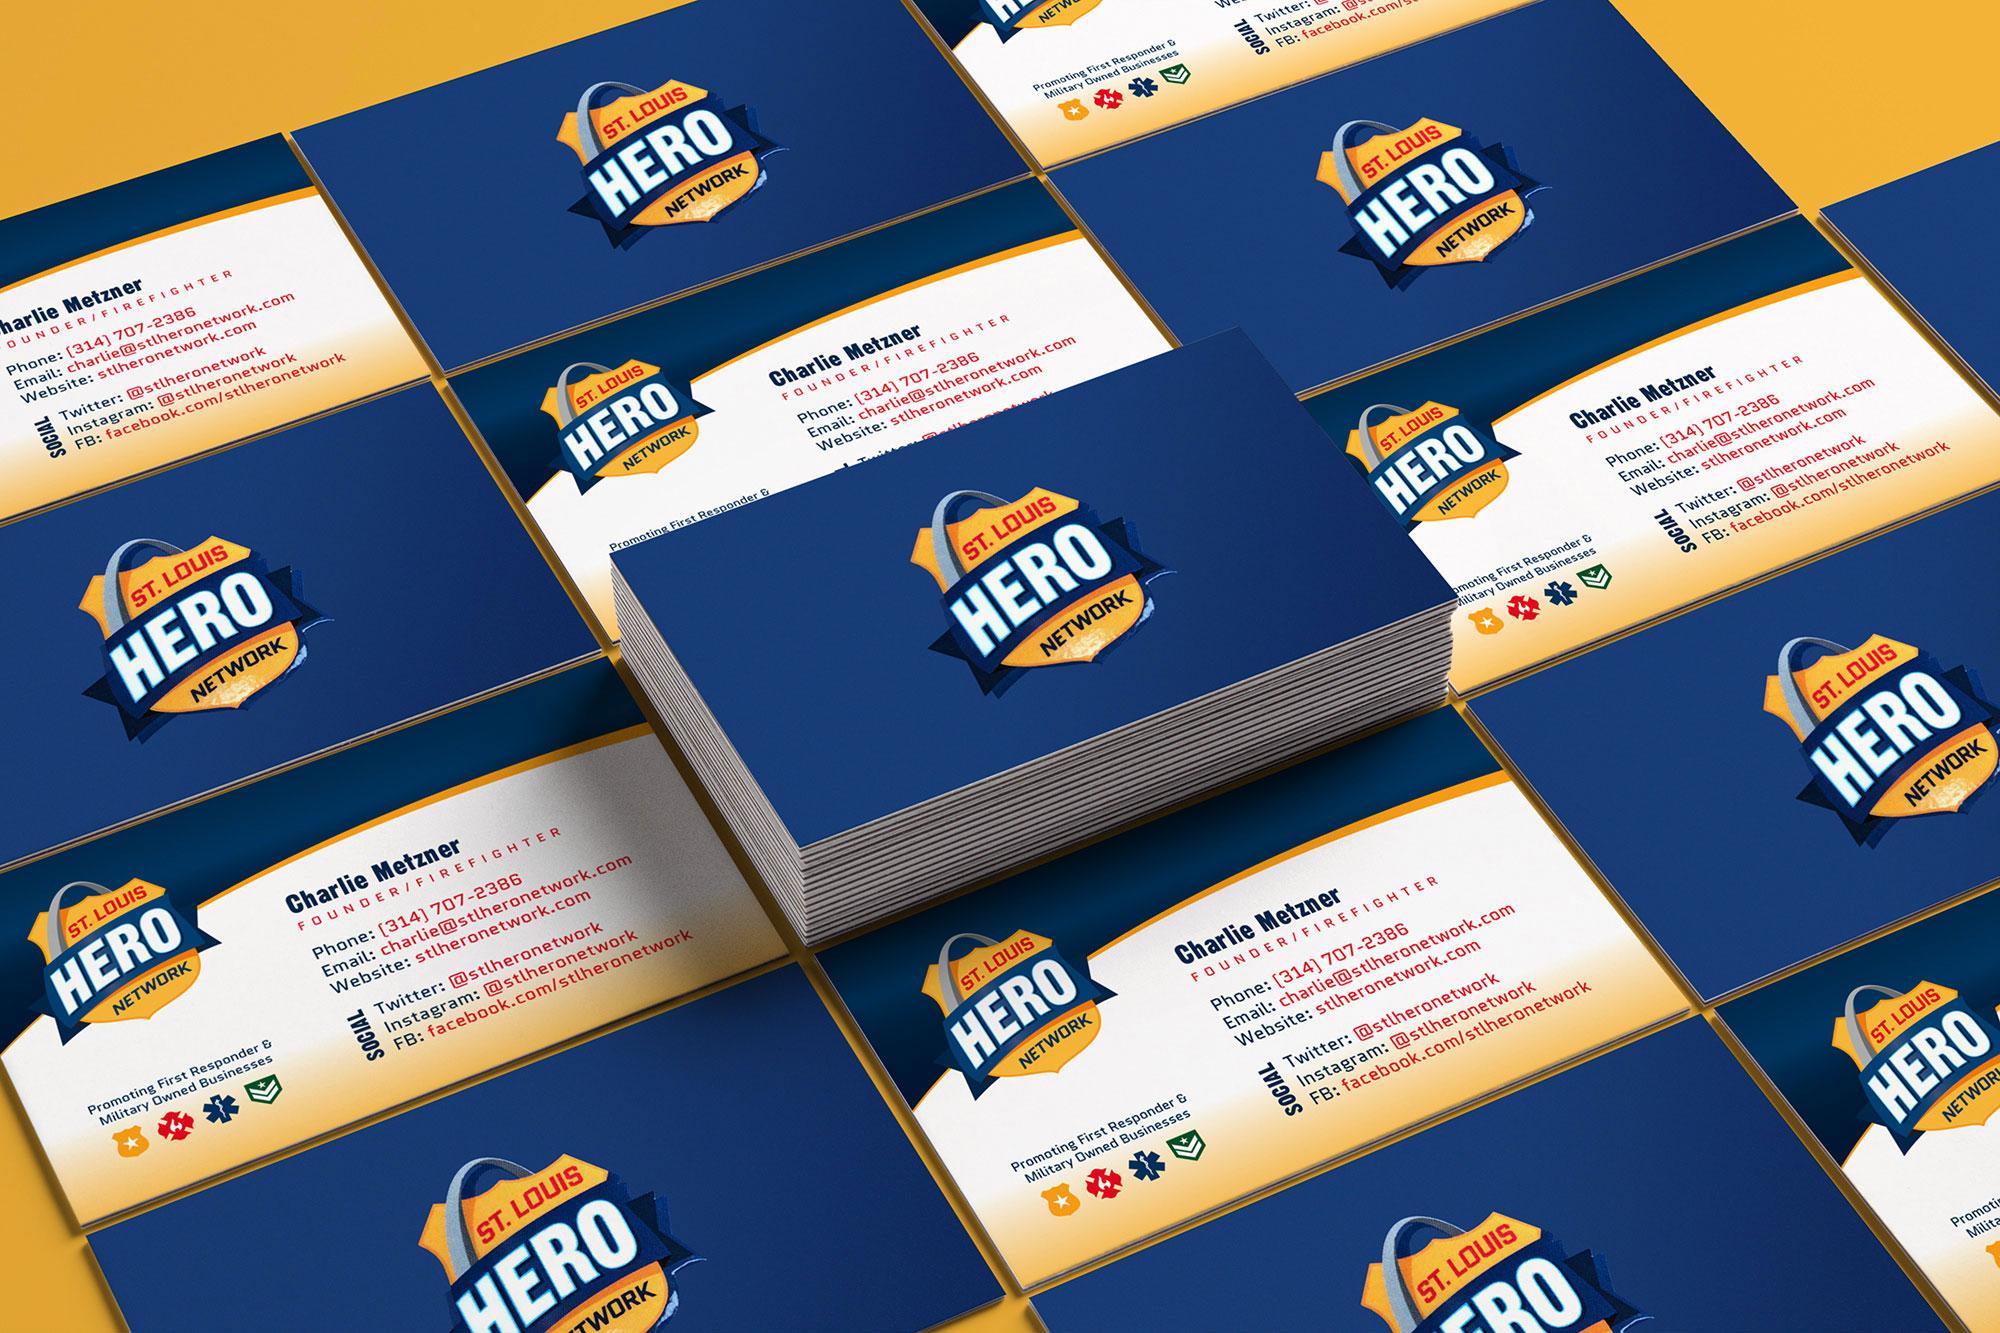 hero-business-card-design2